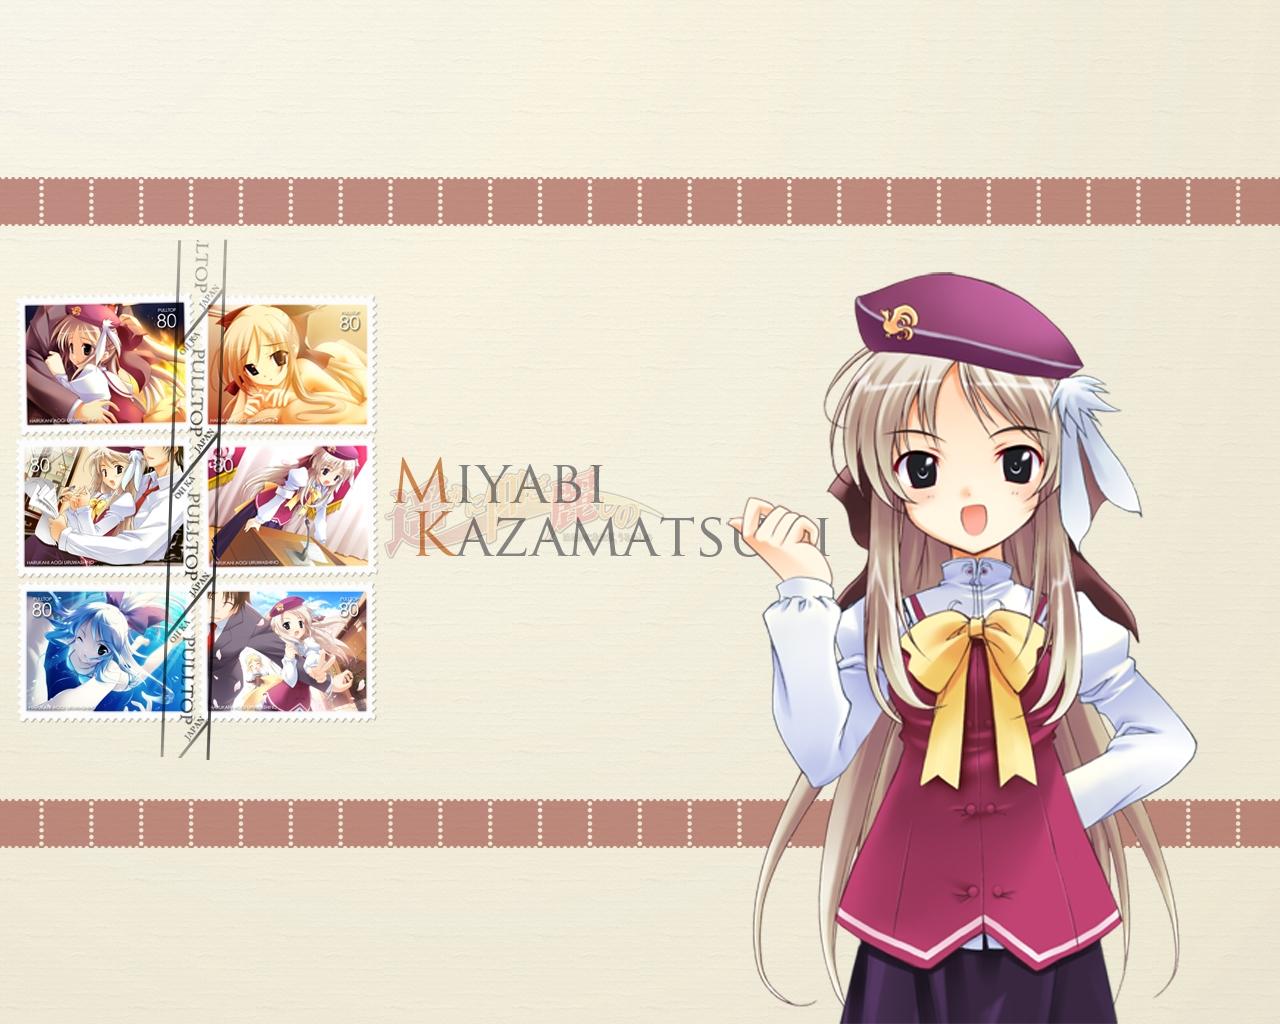 Wallpaper Ilustrasi Anime Gambar Kartun Pola Berwarna